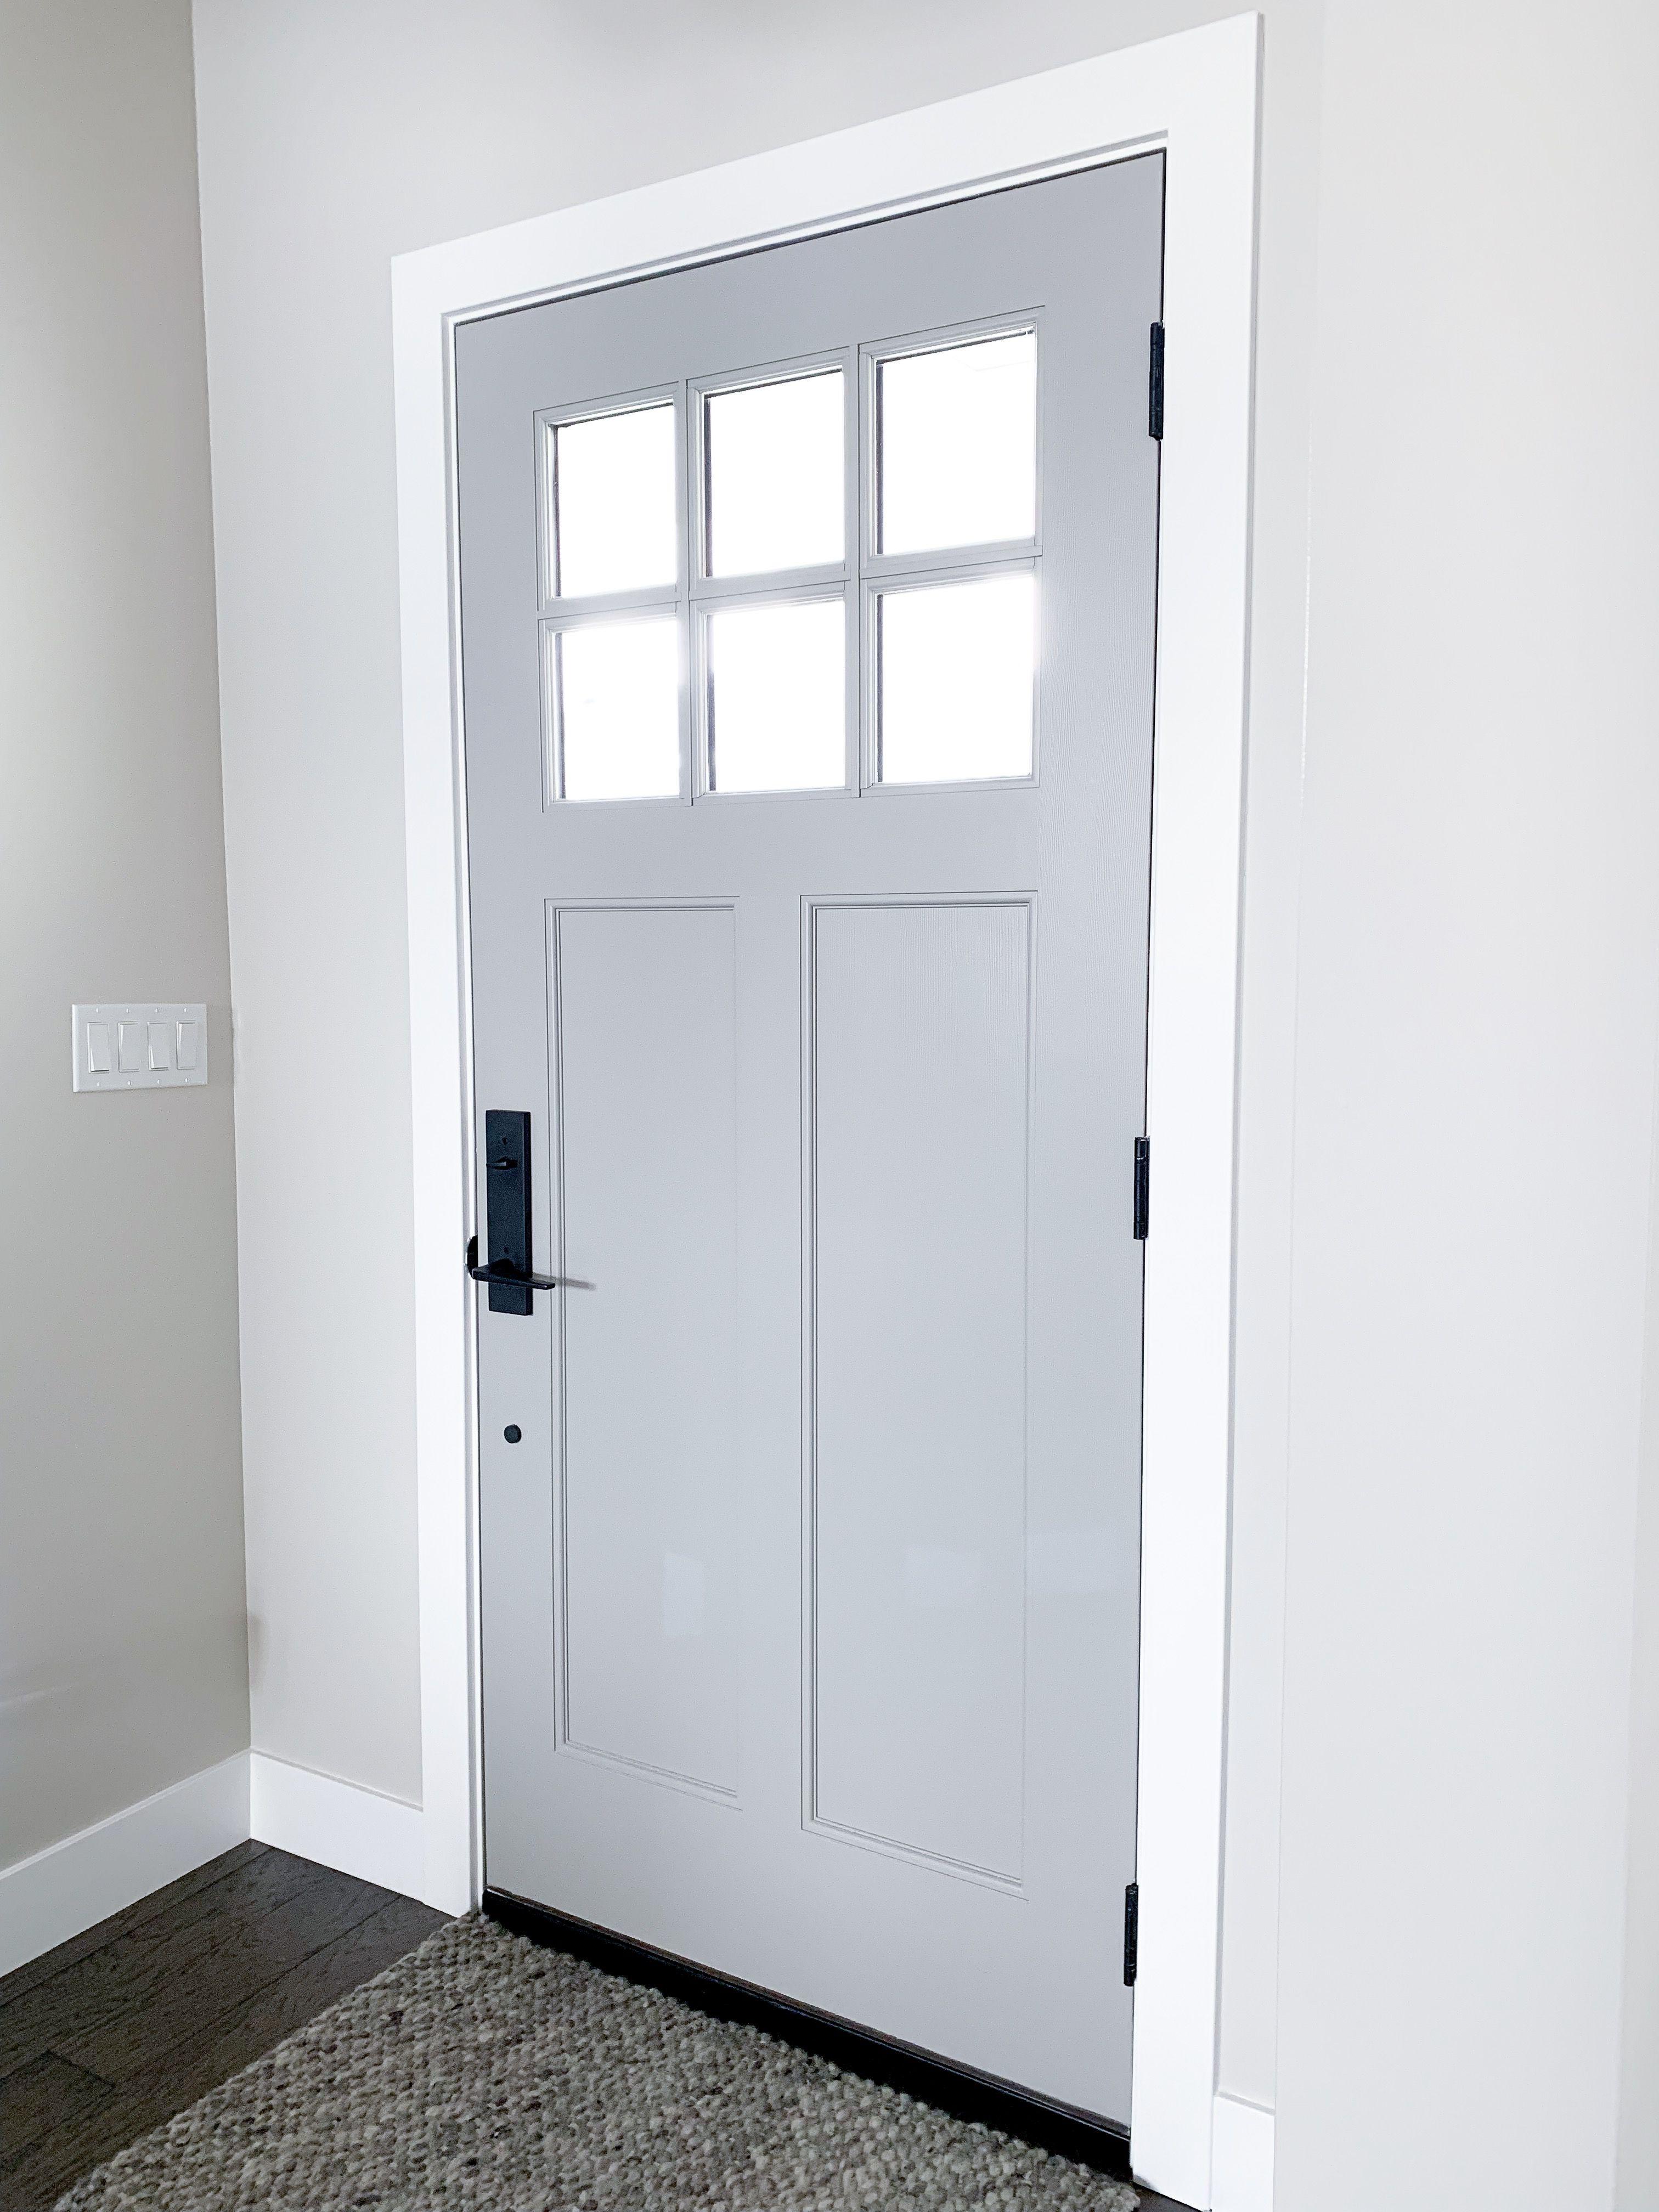 Our Front Door Craftsman Style With Upgraded Matte Black Emtek Hardware Craftsman Style Doors Craftsman Style Exterior Grey Front Doors